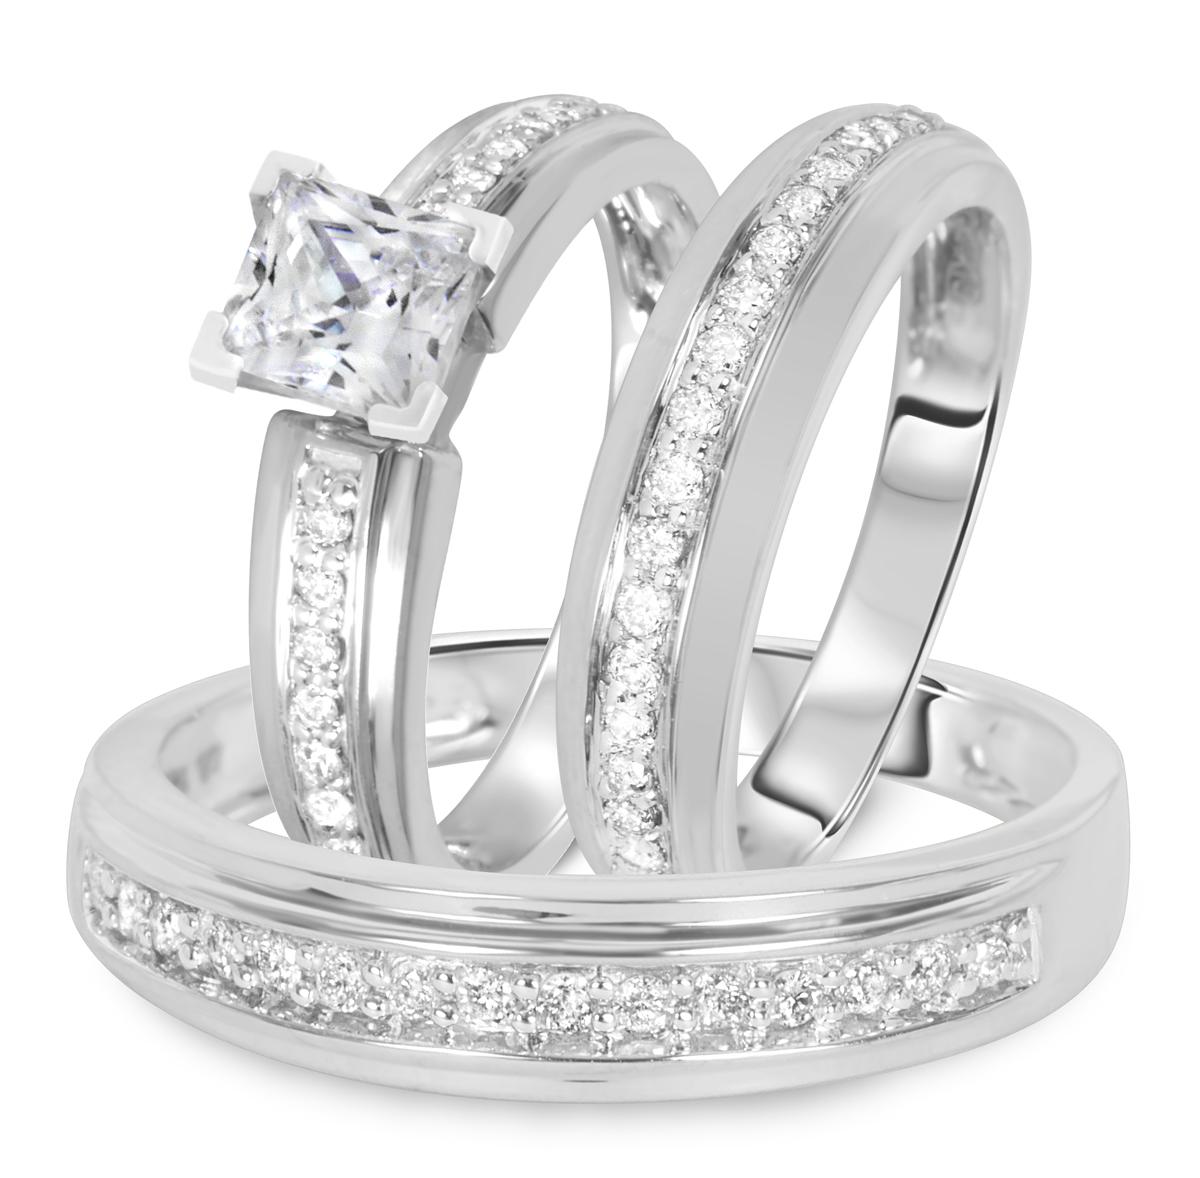 1 1/2 CT. T.W. Diamond Ladies Engagement Ring, Wedding Band, Men's Wedding Band